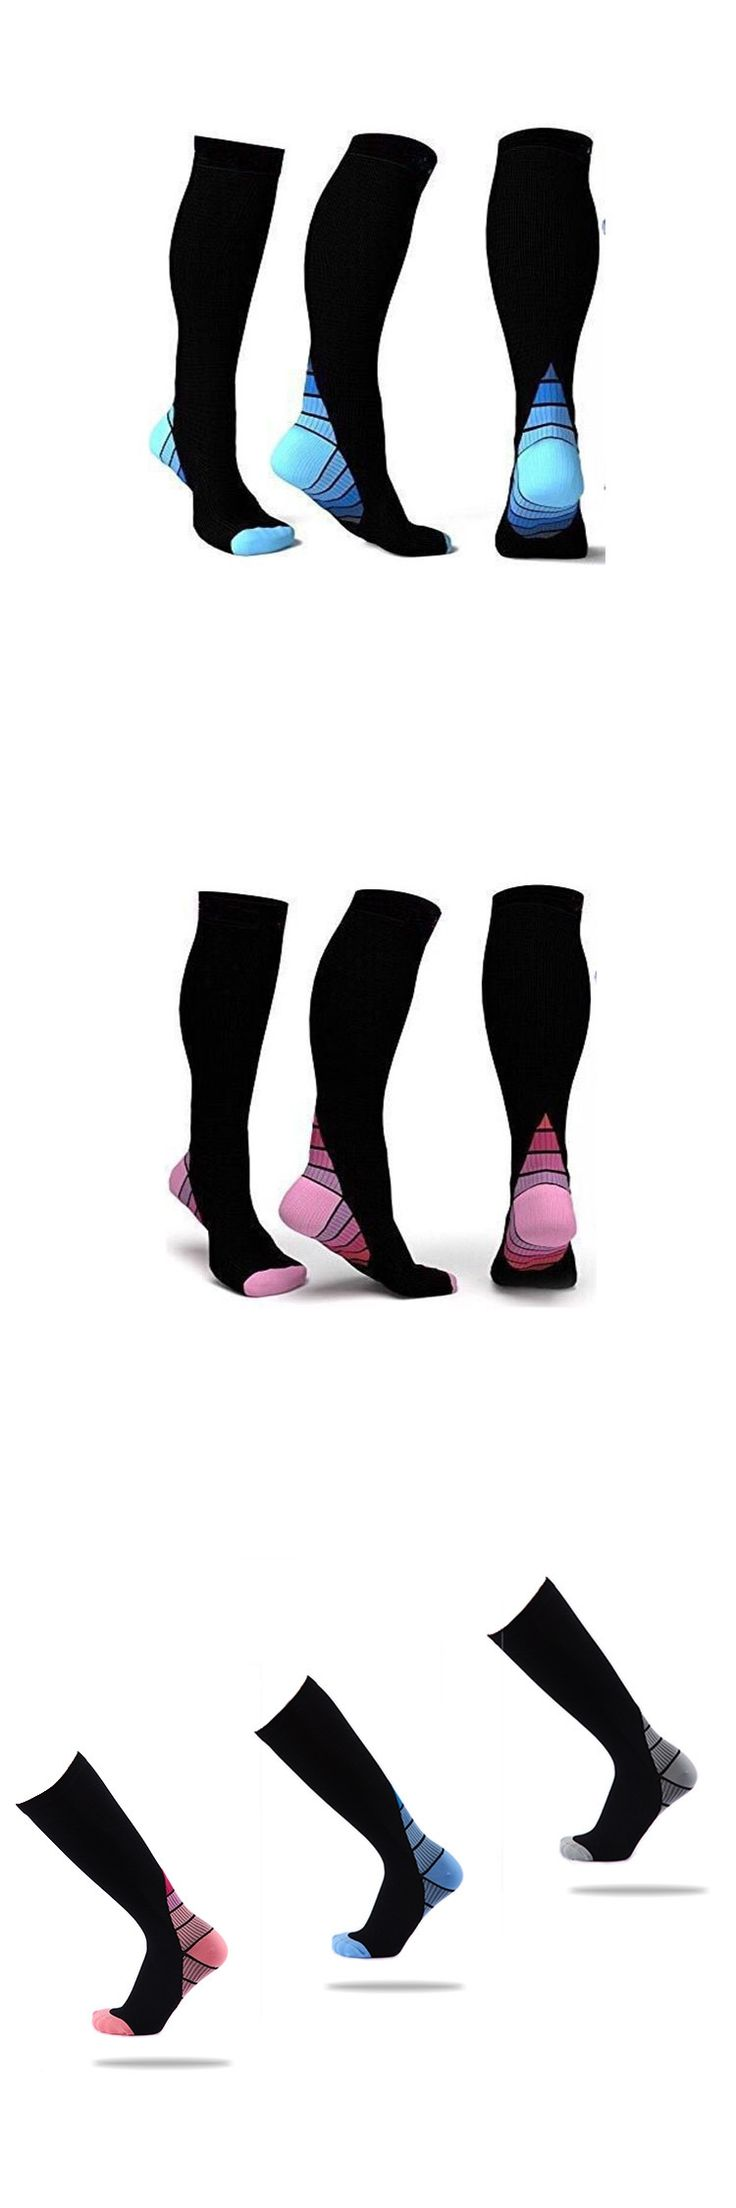 Men's Professional Compression Socks Breathable Travel long Activities Fit for Nurses Shin Splints Flight Travel